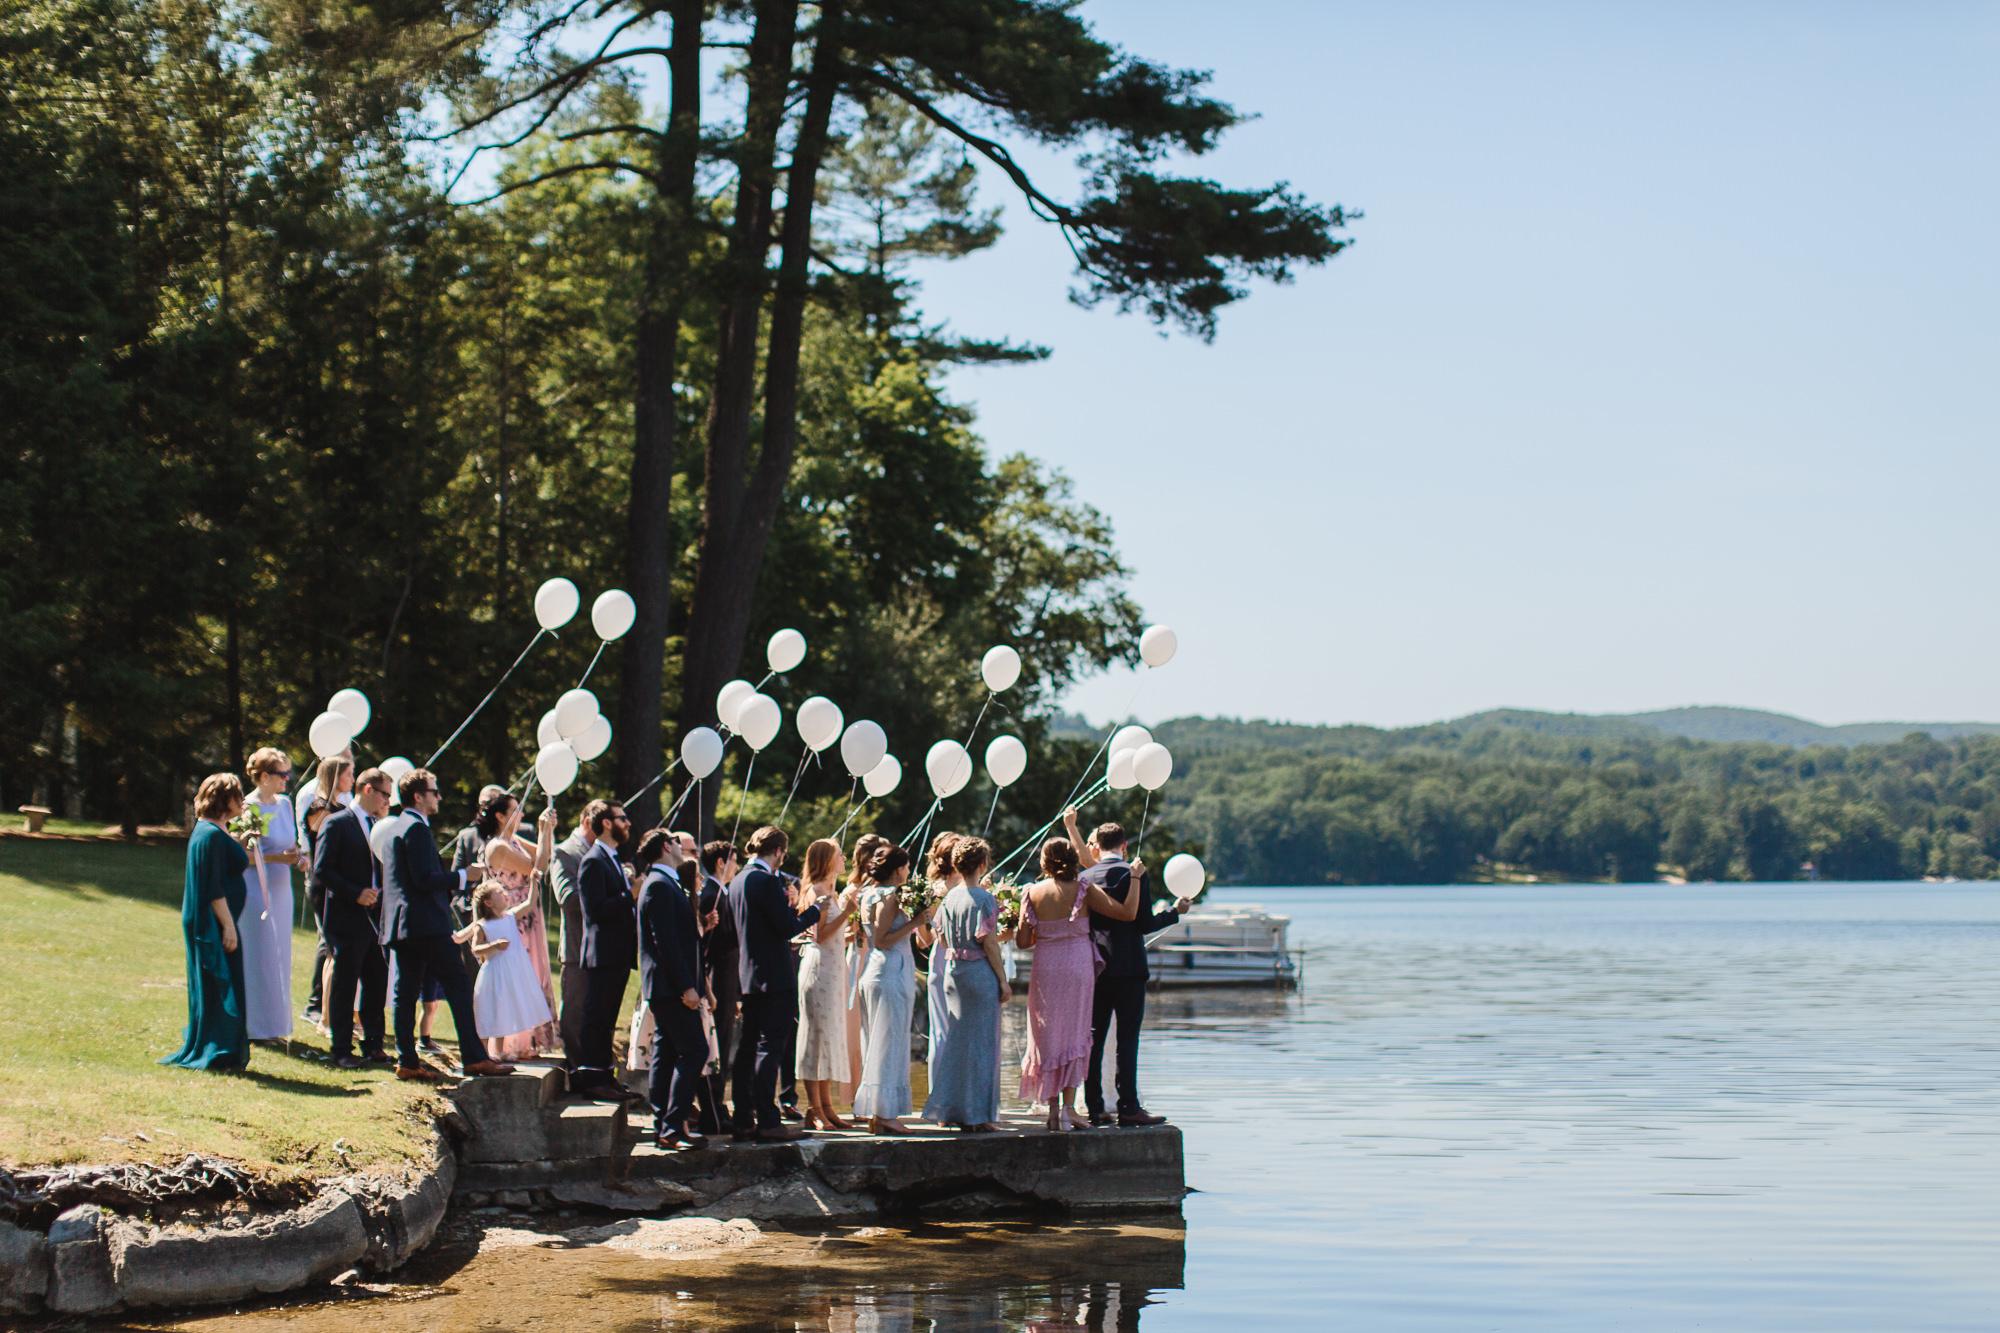 connecticut-summer-lake-wedding-emily-kirke-photography-upstyle (66 of 181).jpg